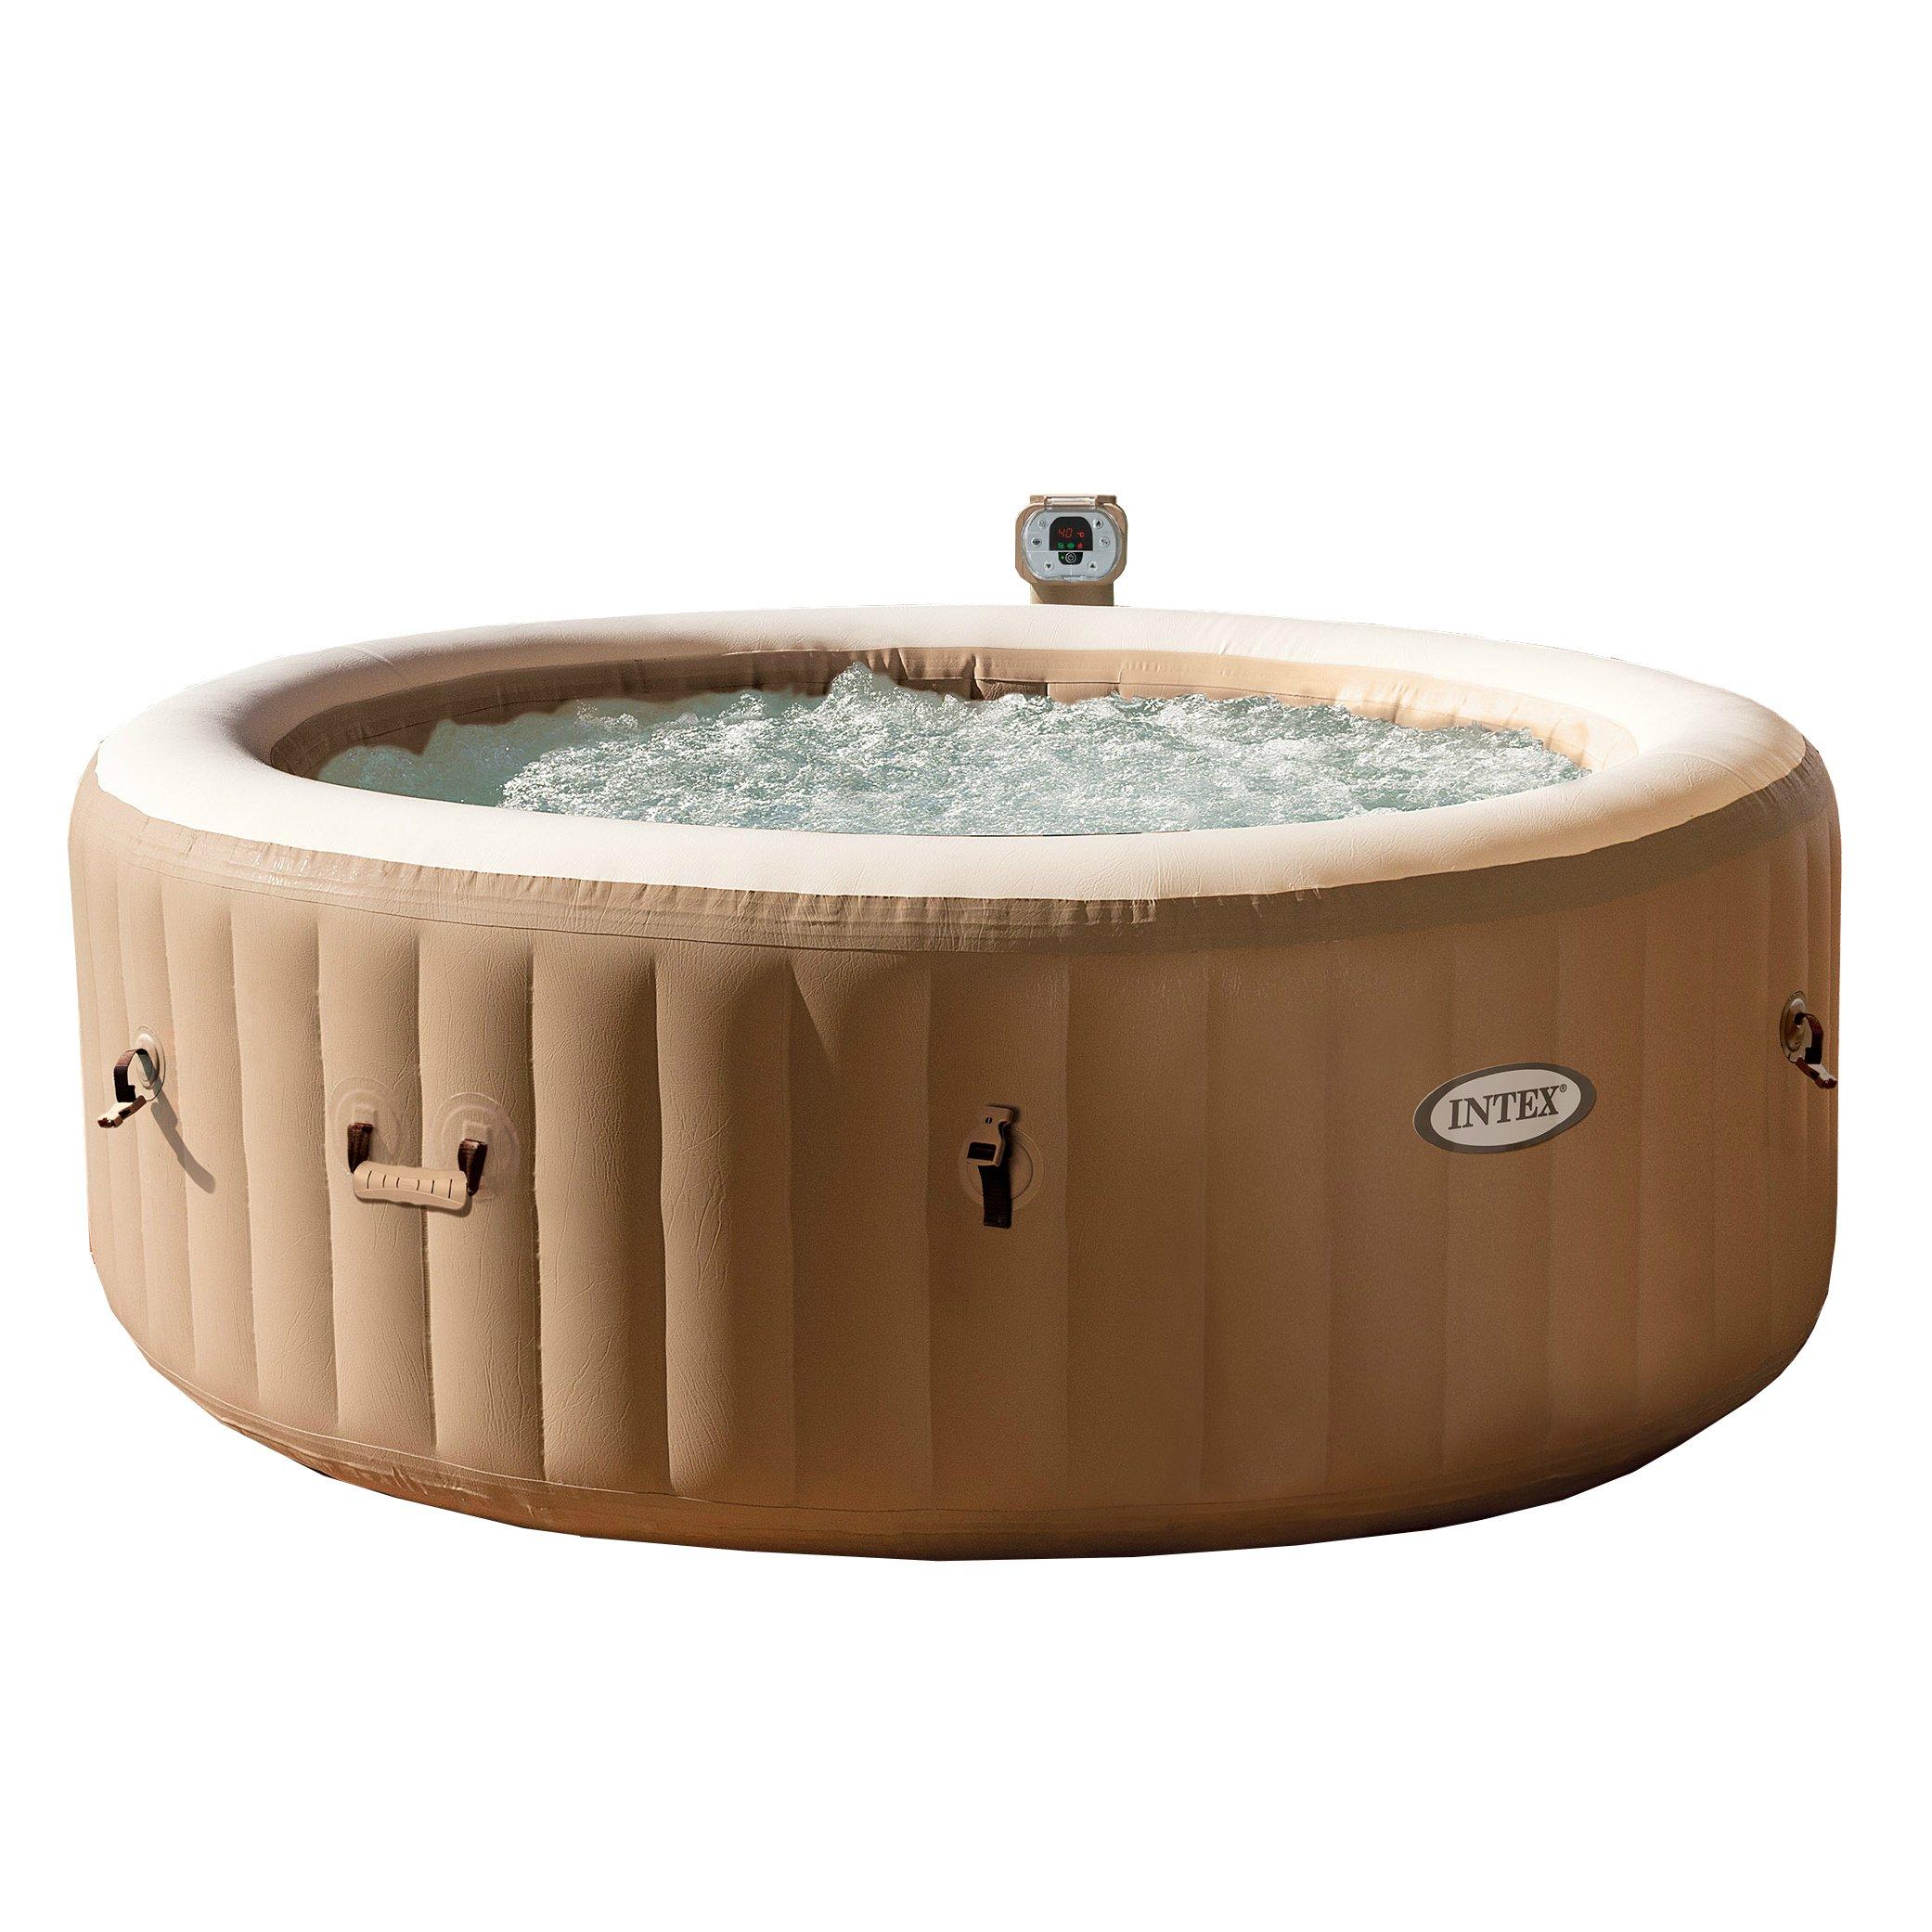 Intex 77in PureSpa Portable Bubble Massage Spa Set by Intex